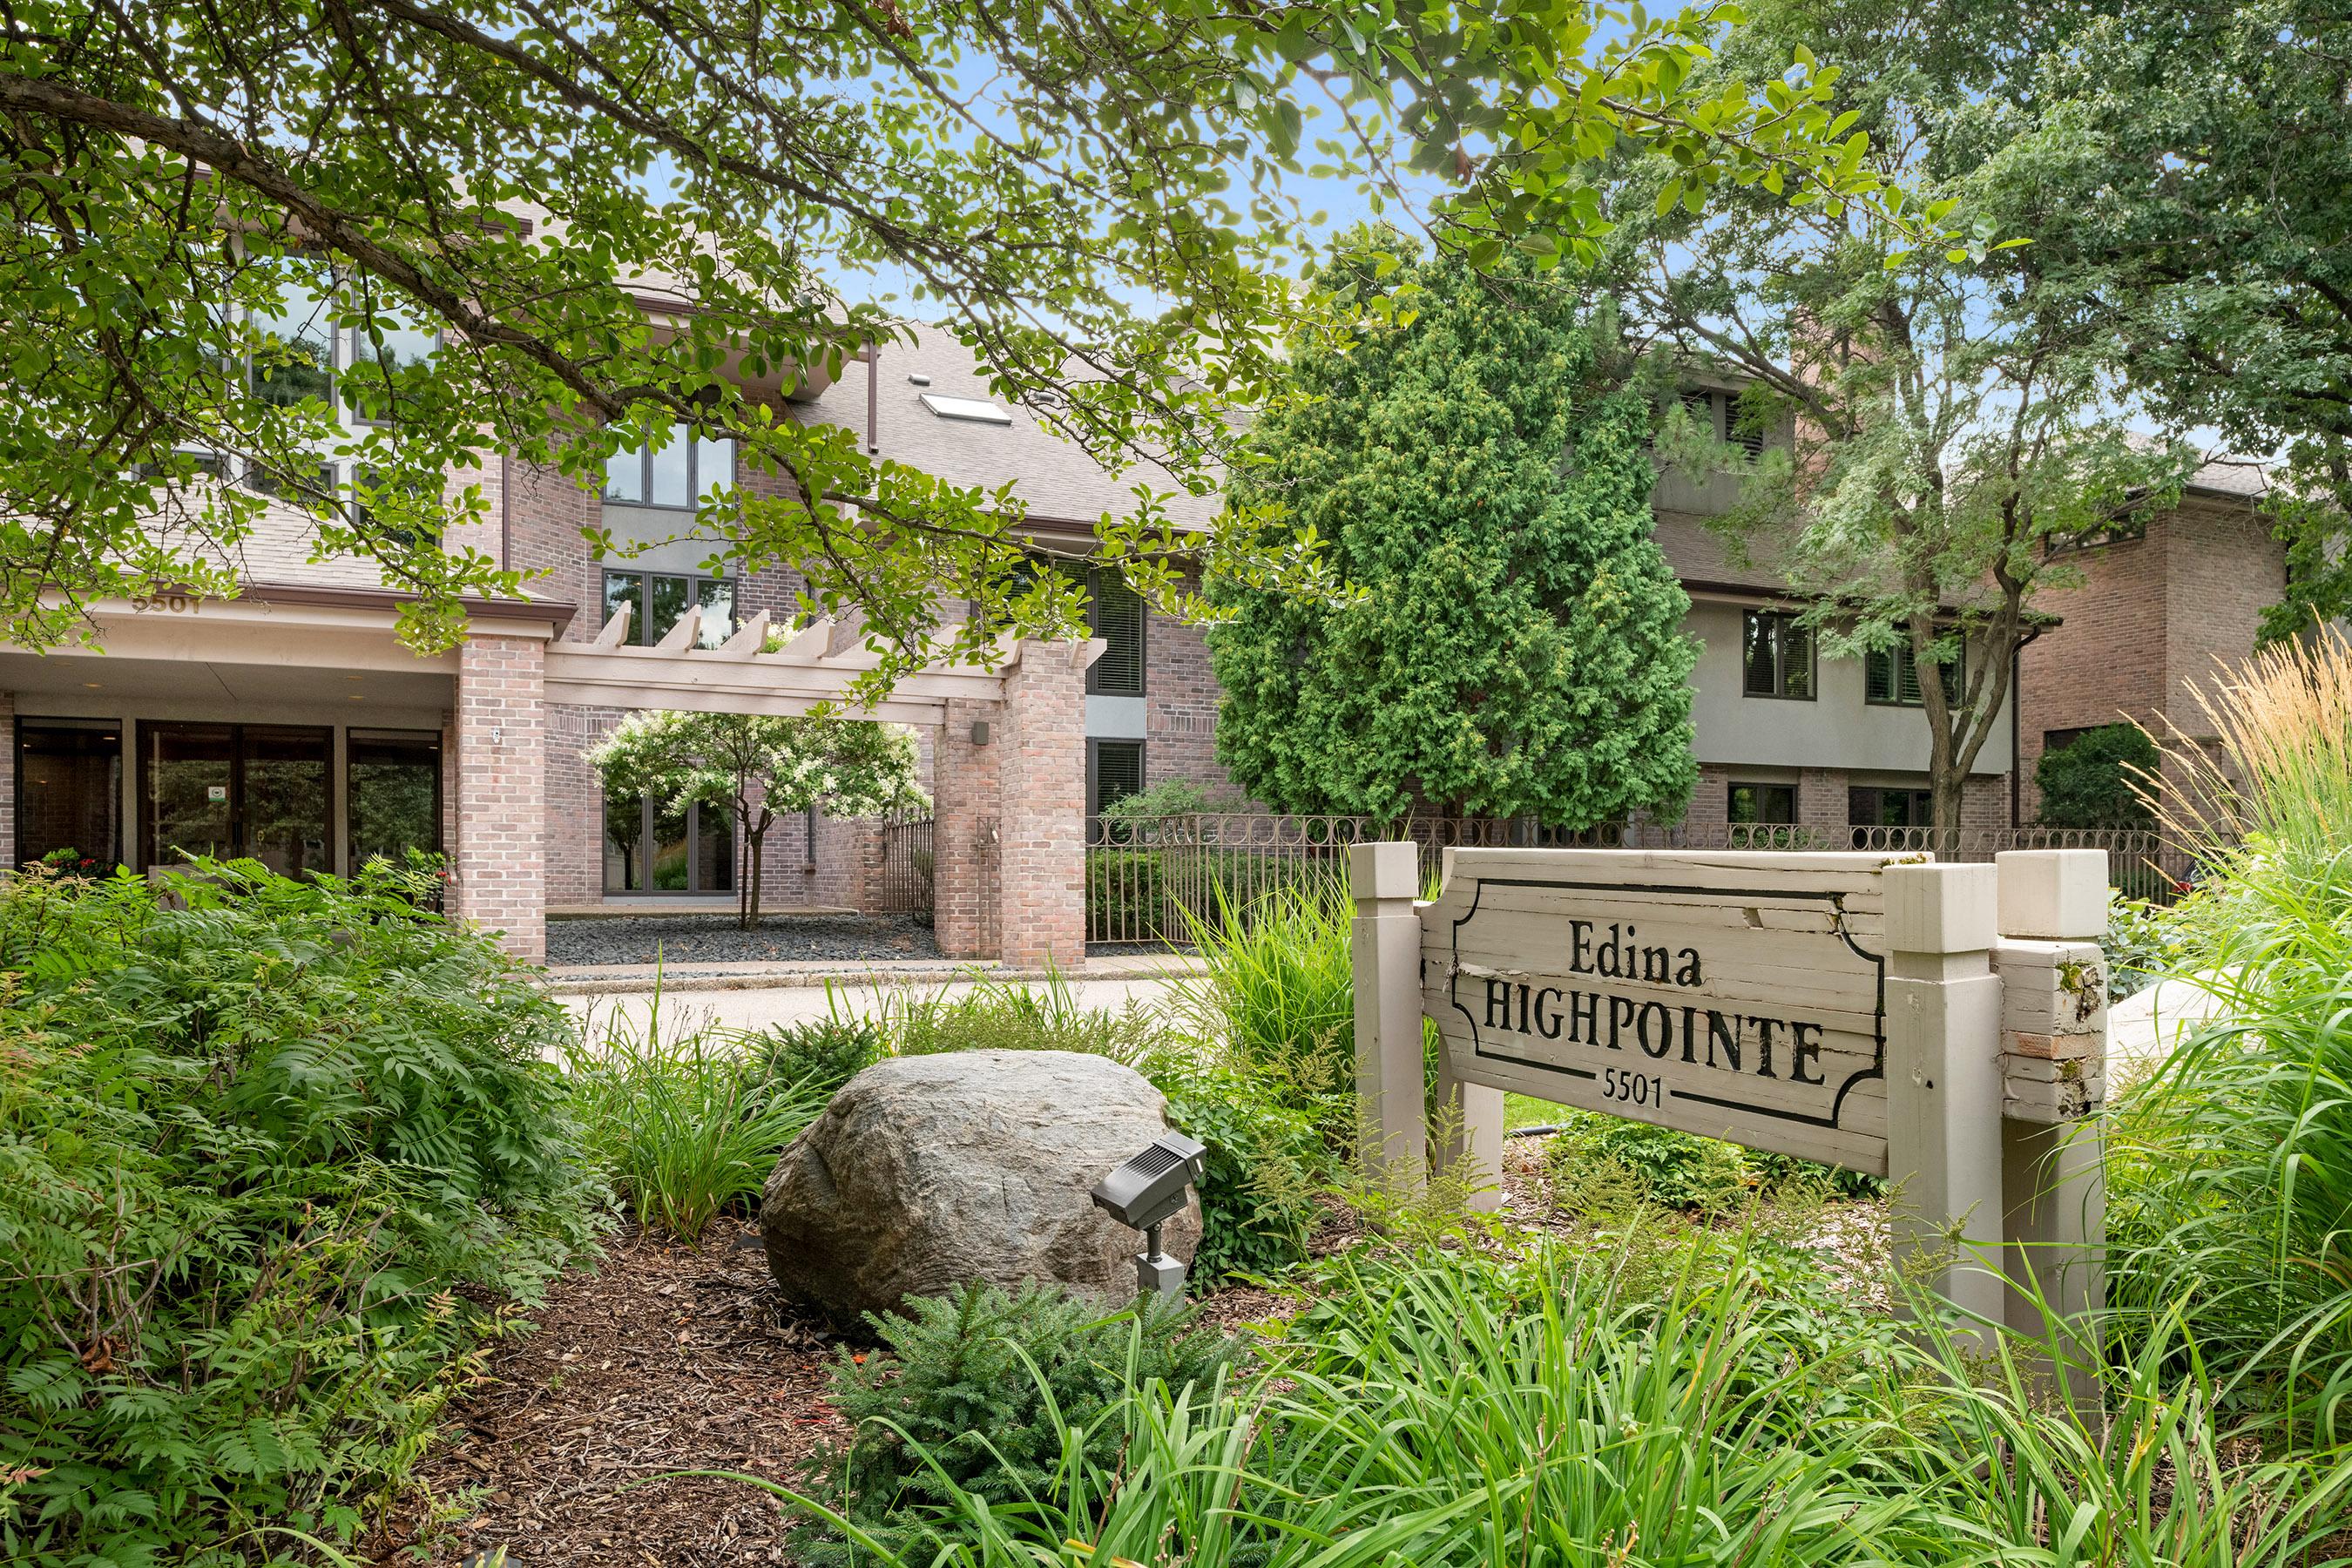 The Edina Highpoint Condominiums are in a convenient Edina location